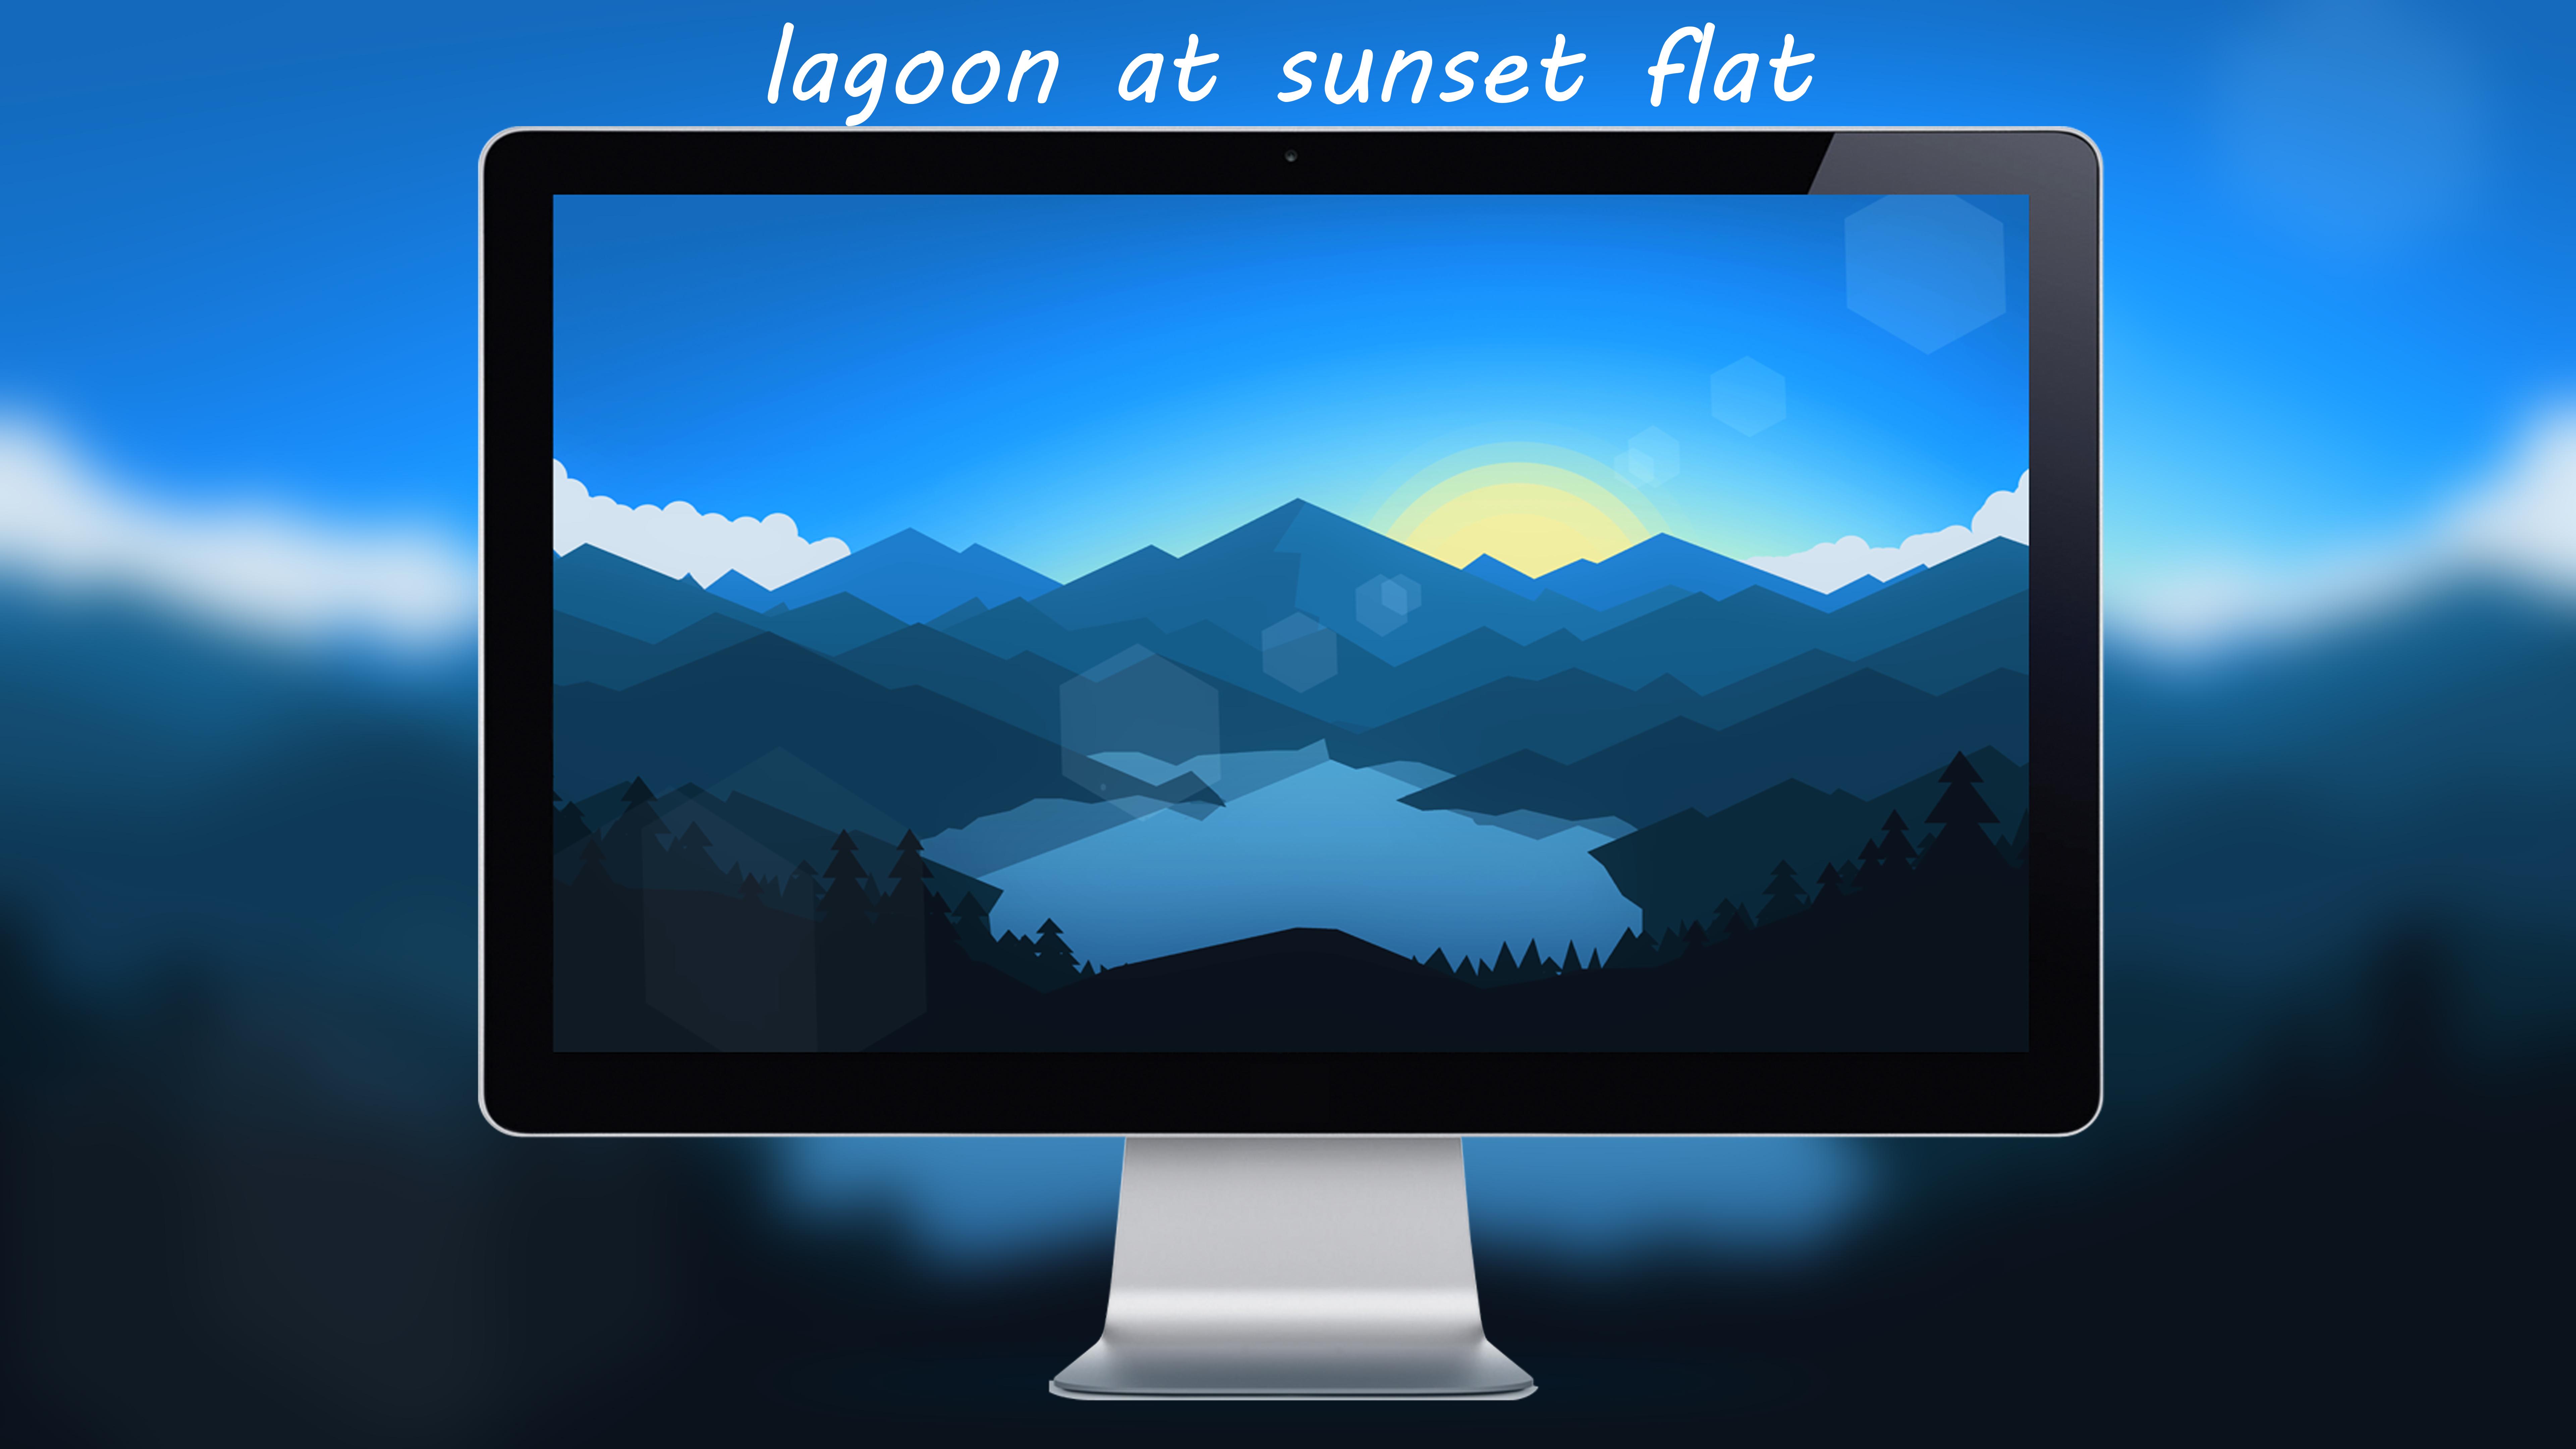 Lagoon At Sunset By Desinguchiha by designuchiha